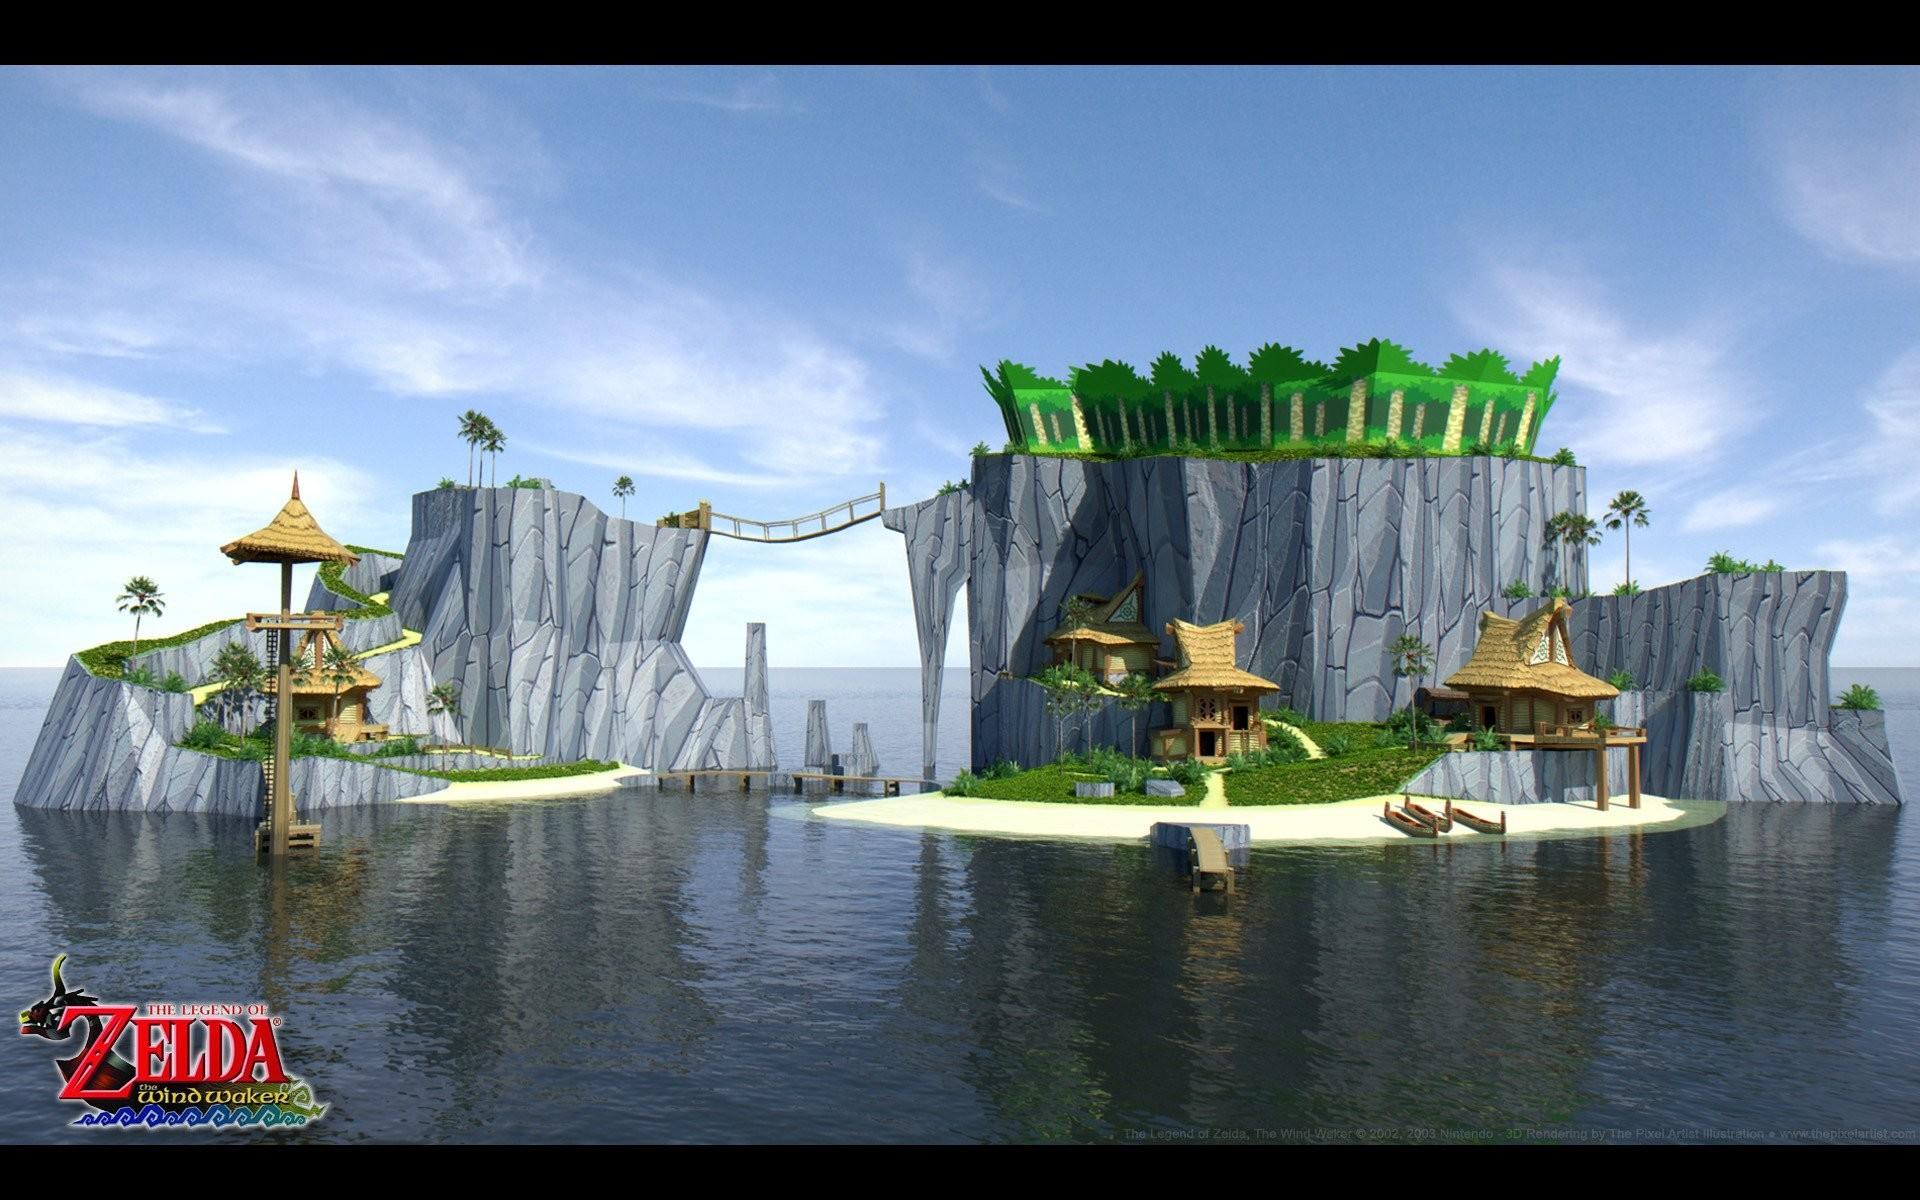 The Legend of Zelda The Legend of Zelda: The Wind Waker Outset Island  wallpaper | | 253513 | WallpaperUP